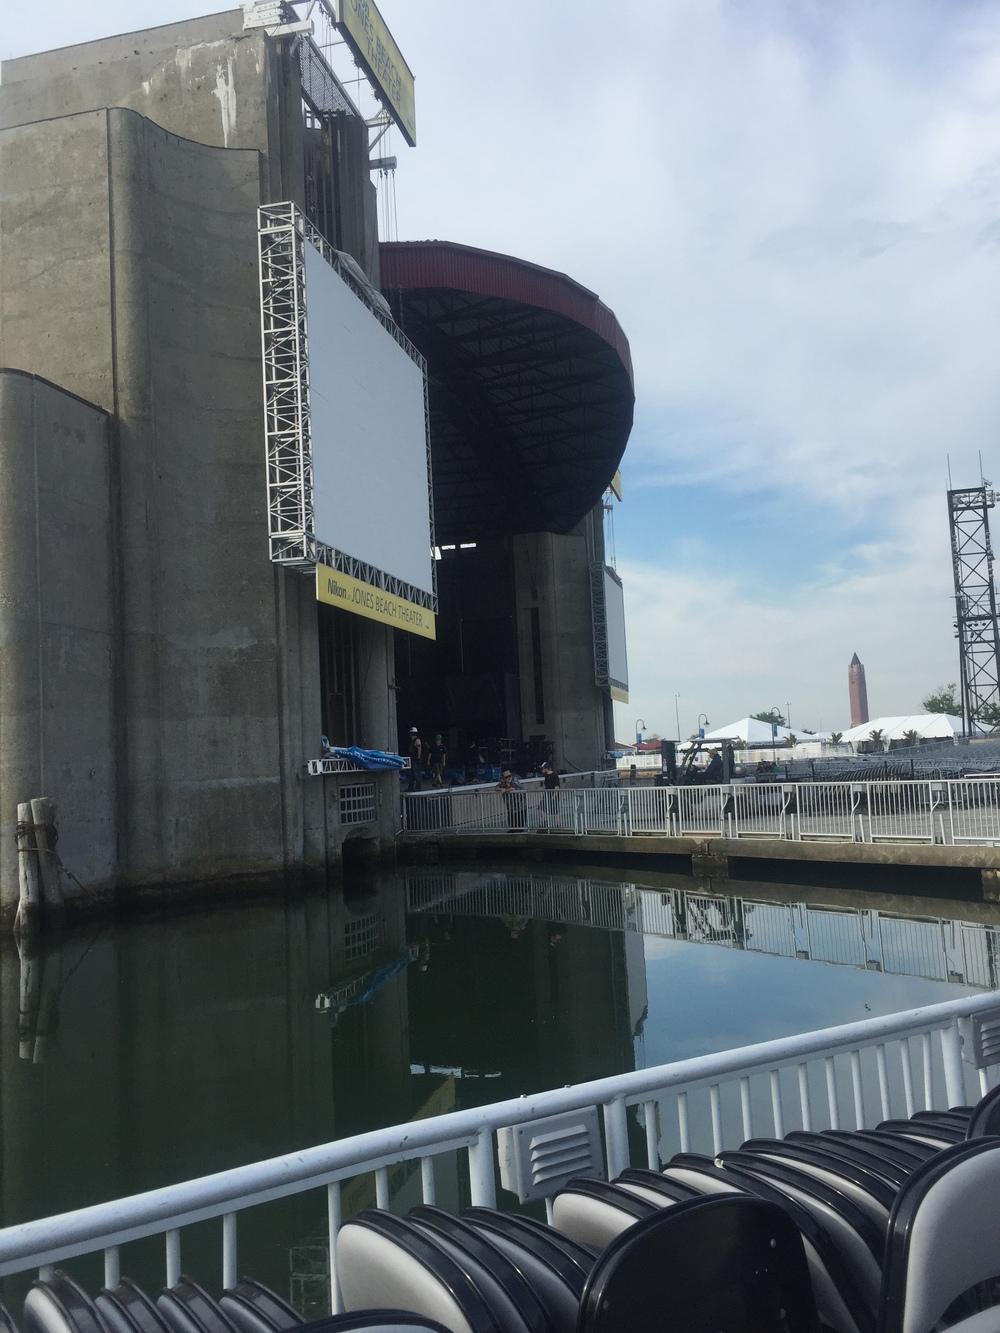 Floating venue on the ocean